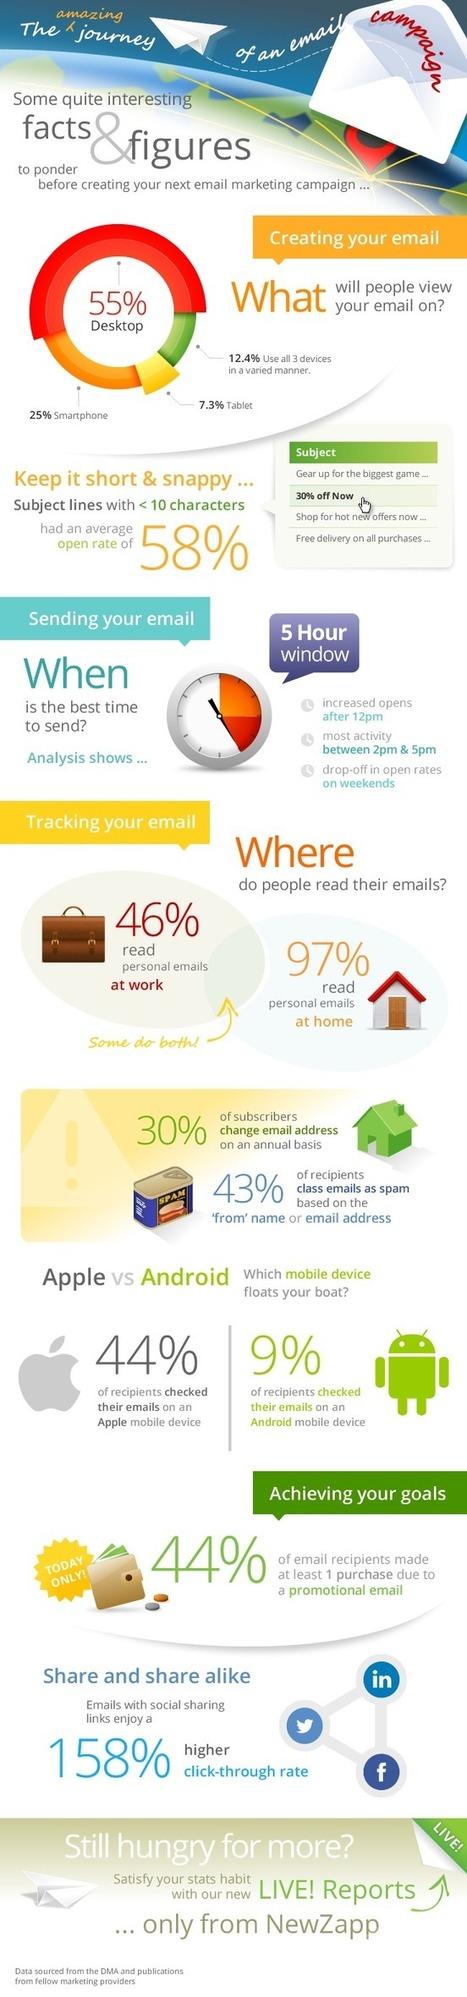 Infographie – Le fabuleux voyage d'une campagne emailing | Raffles Media | Email Marketing, Optimisation des conversions | Email Marketing | Scoop.it